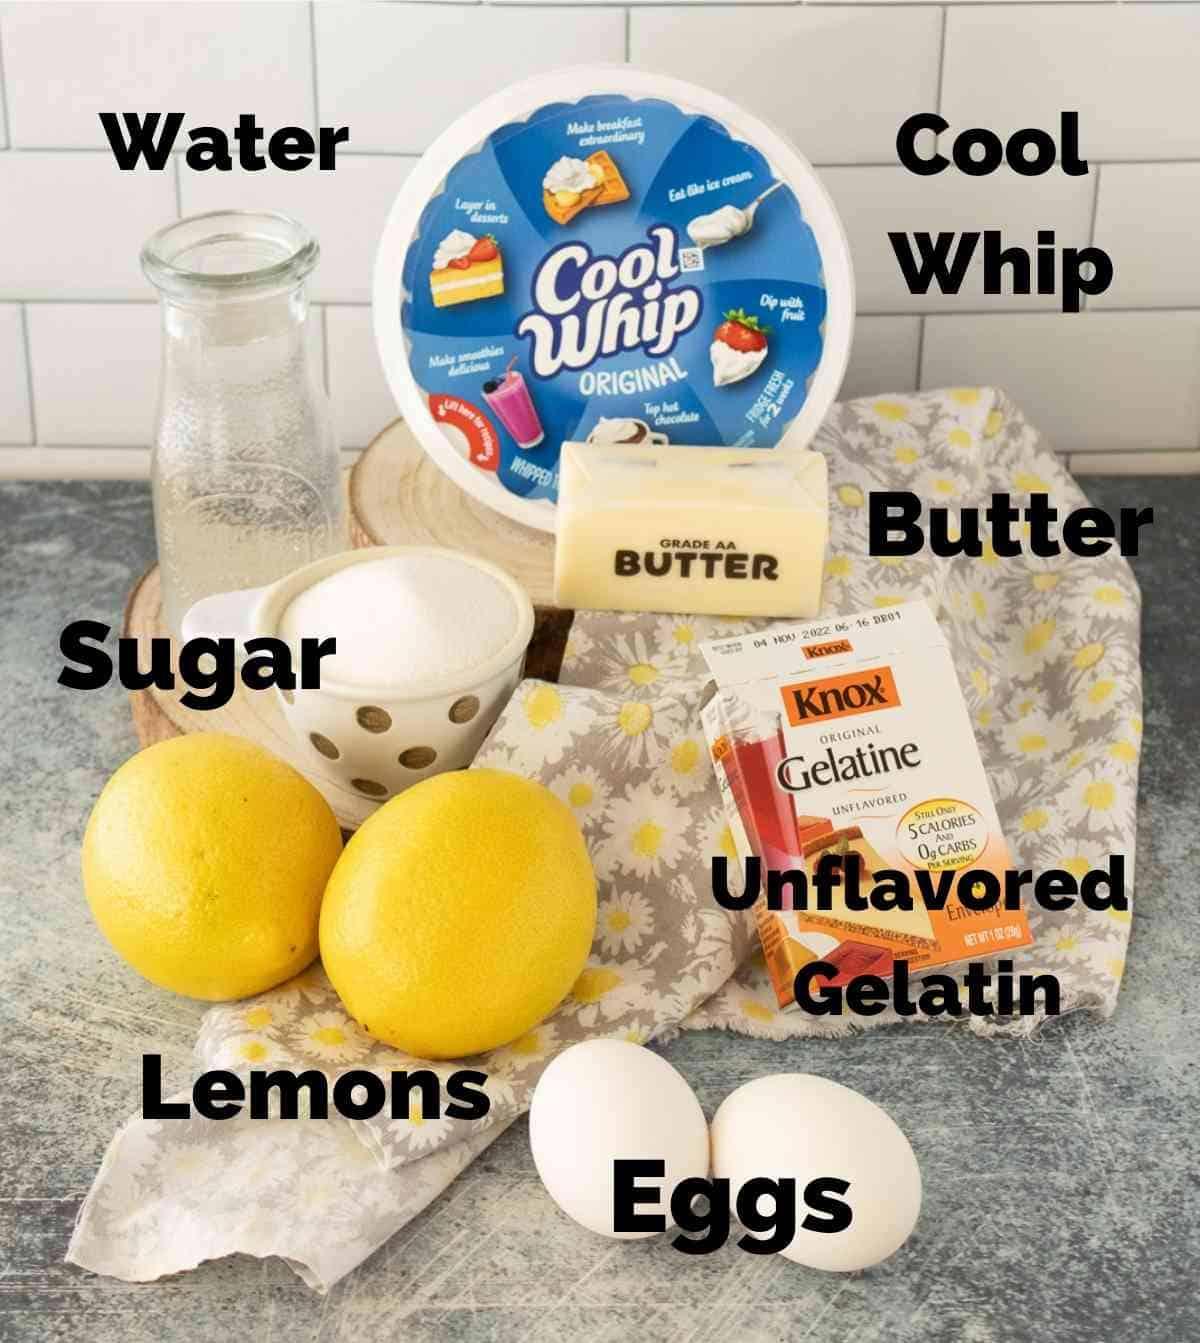 Ingredients for lemon jello salad.